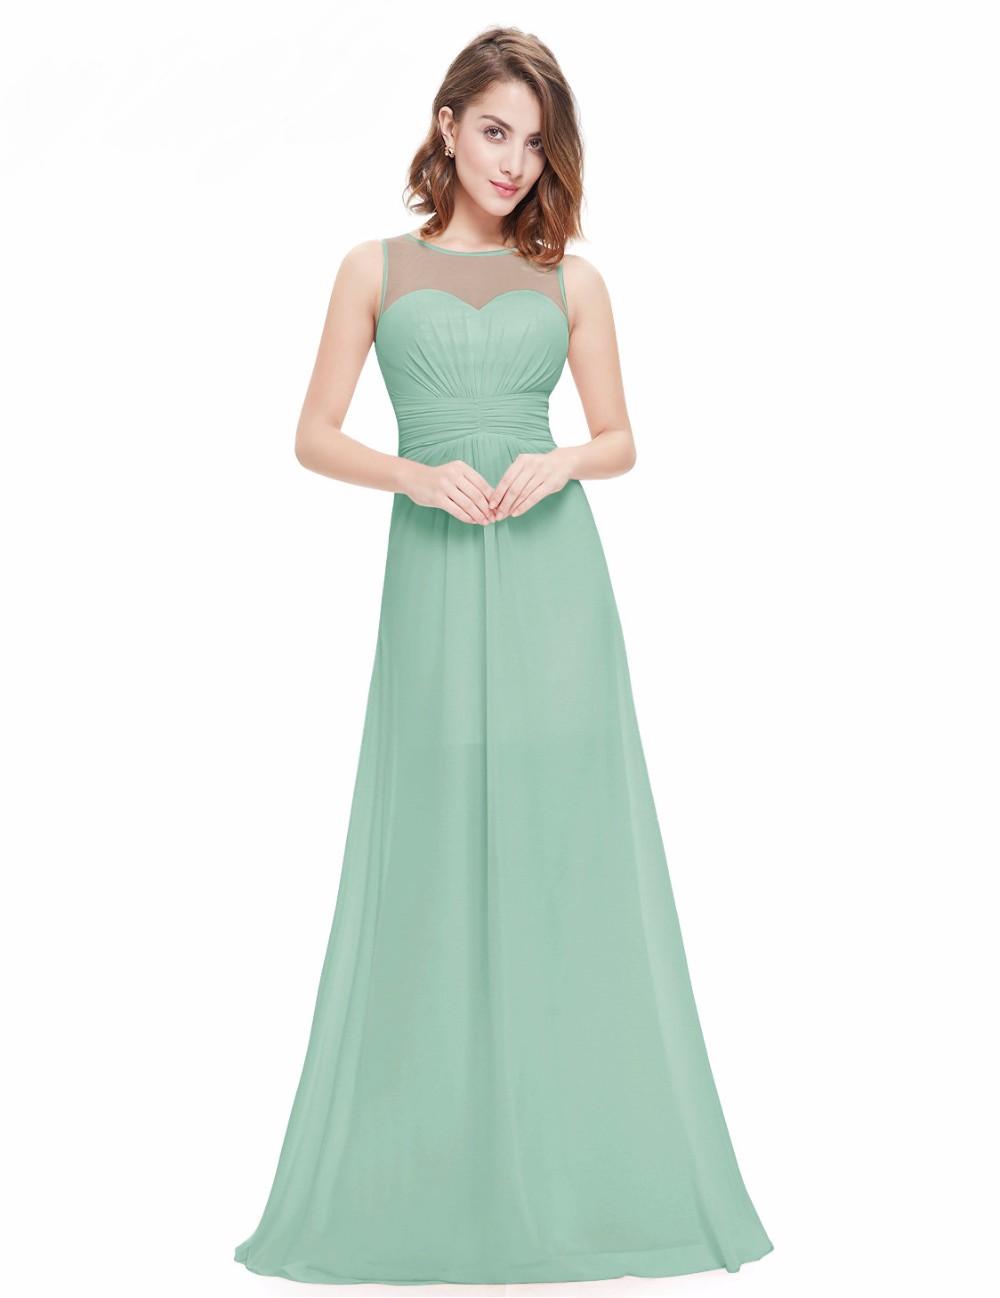 c14d1de543d4 Elegant Sleeveless Long Chiffon A-Line Bridesmaid Dress | Bridesmaid ...